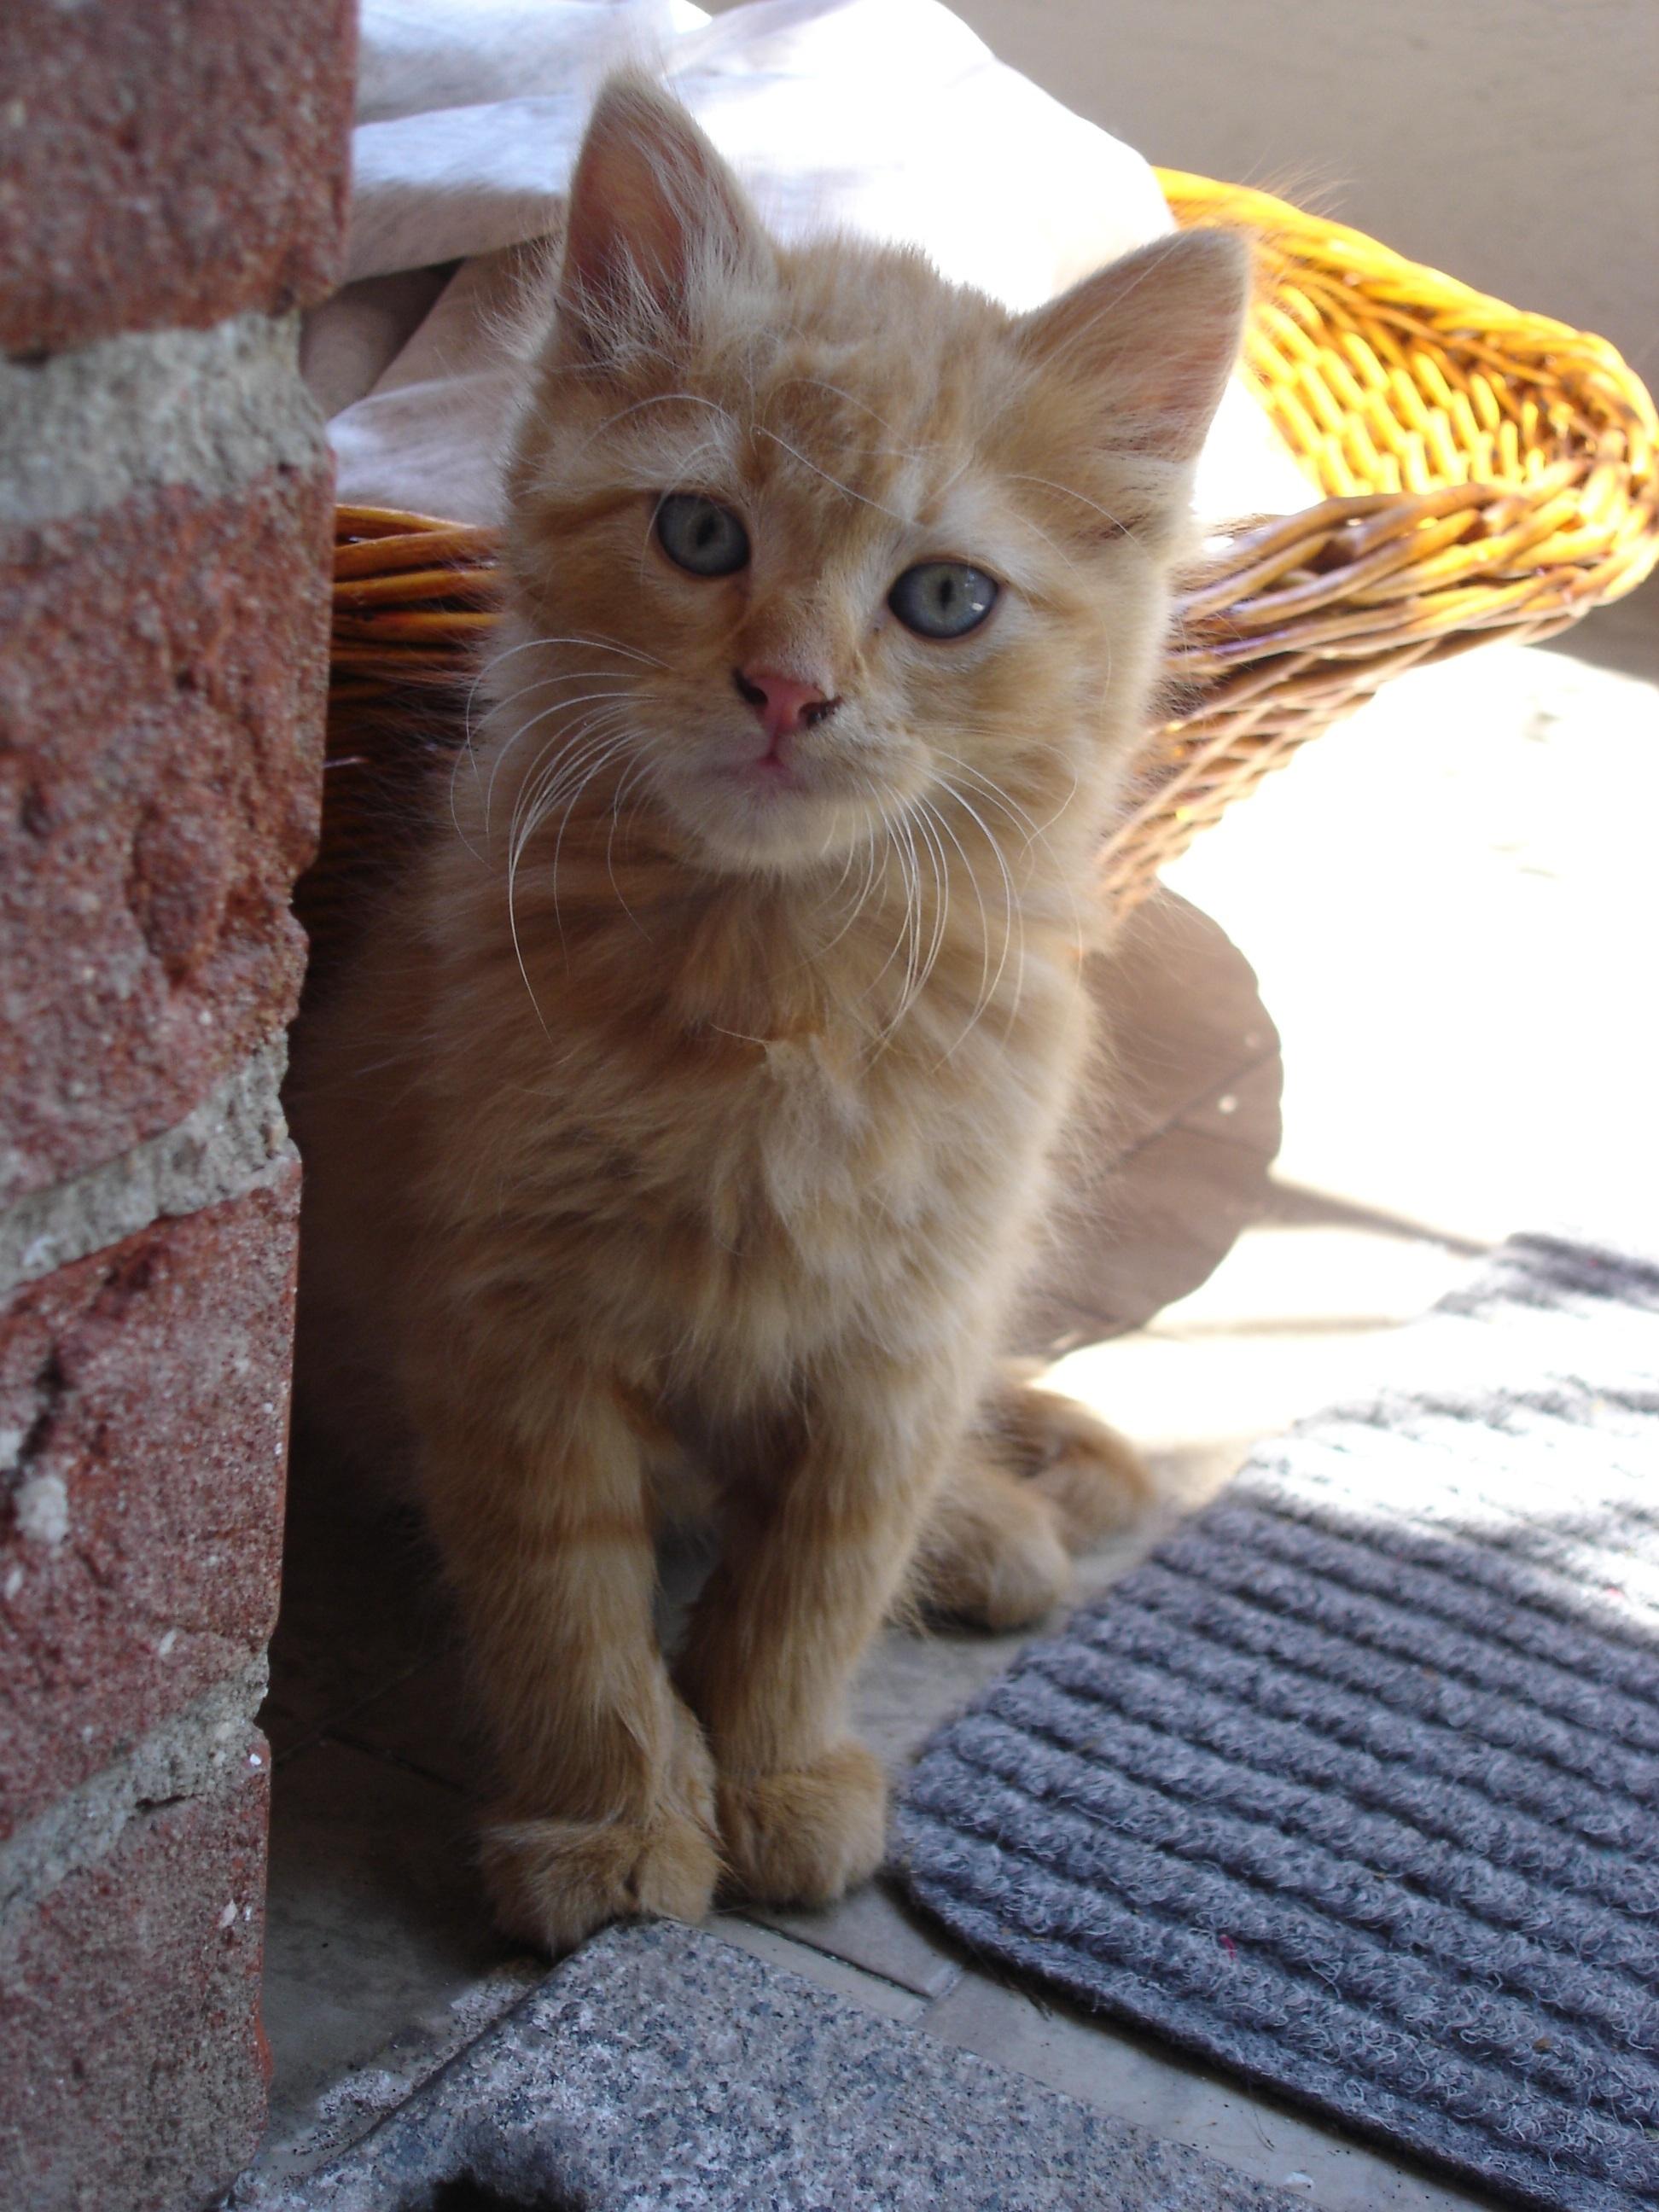 Gambar  anak kucing, binatang menyusui, cambang, bertulang ...